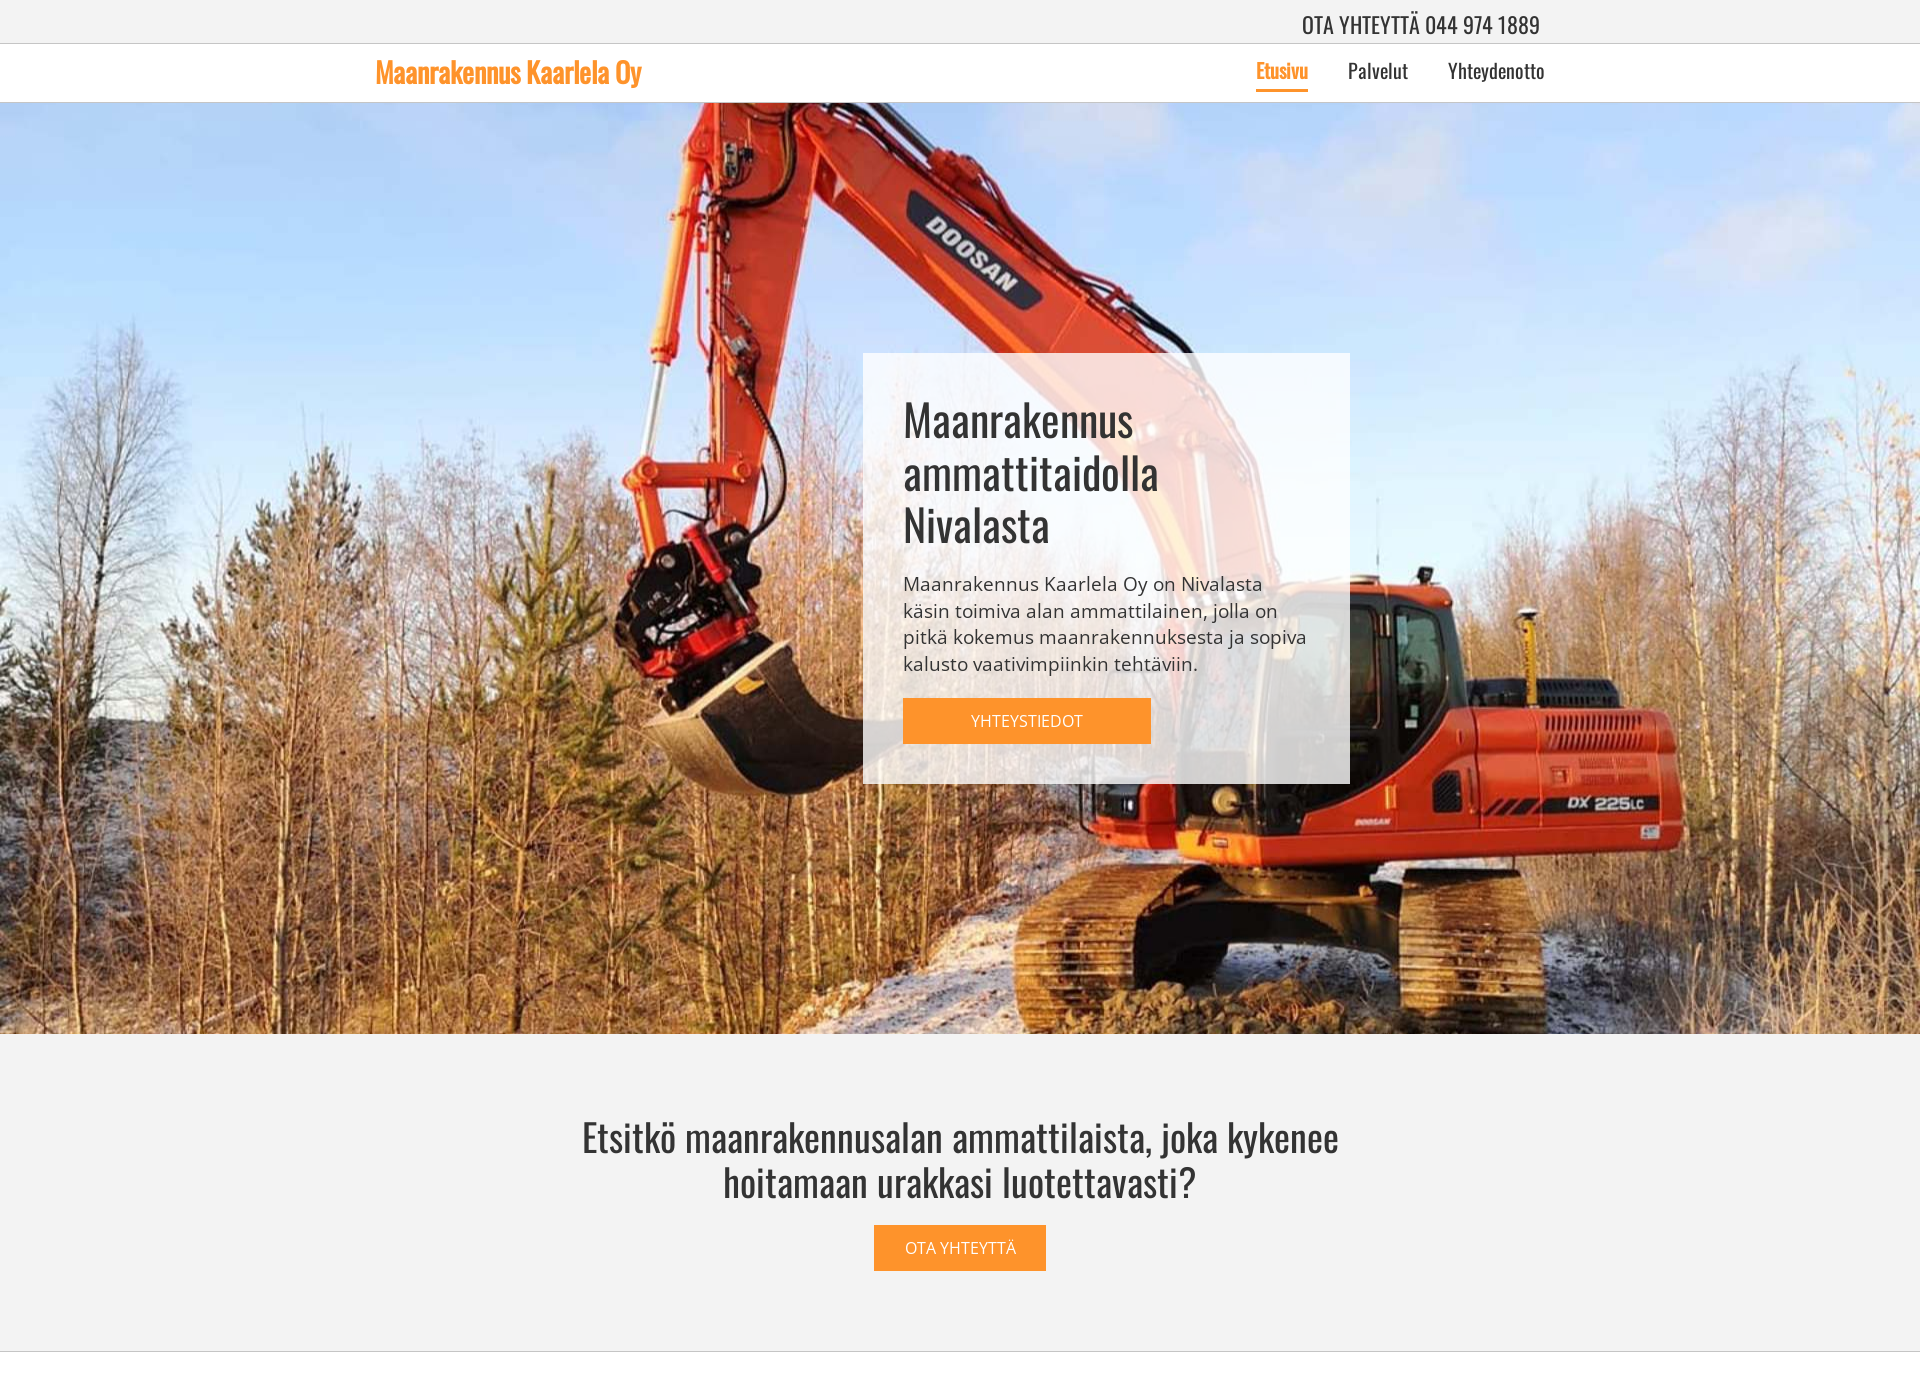 Screenshot for maanrakennuskaarlela.fi